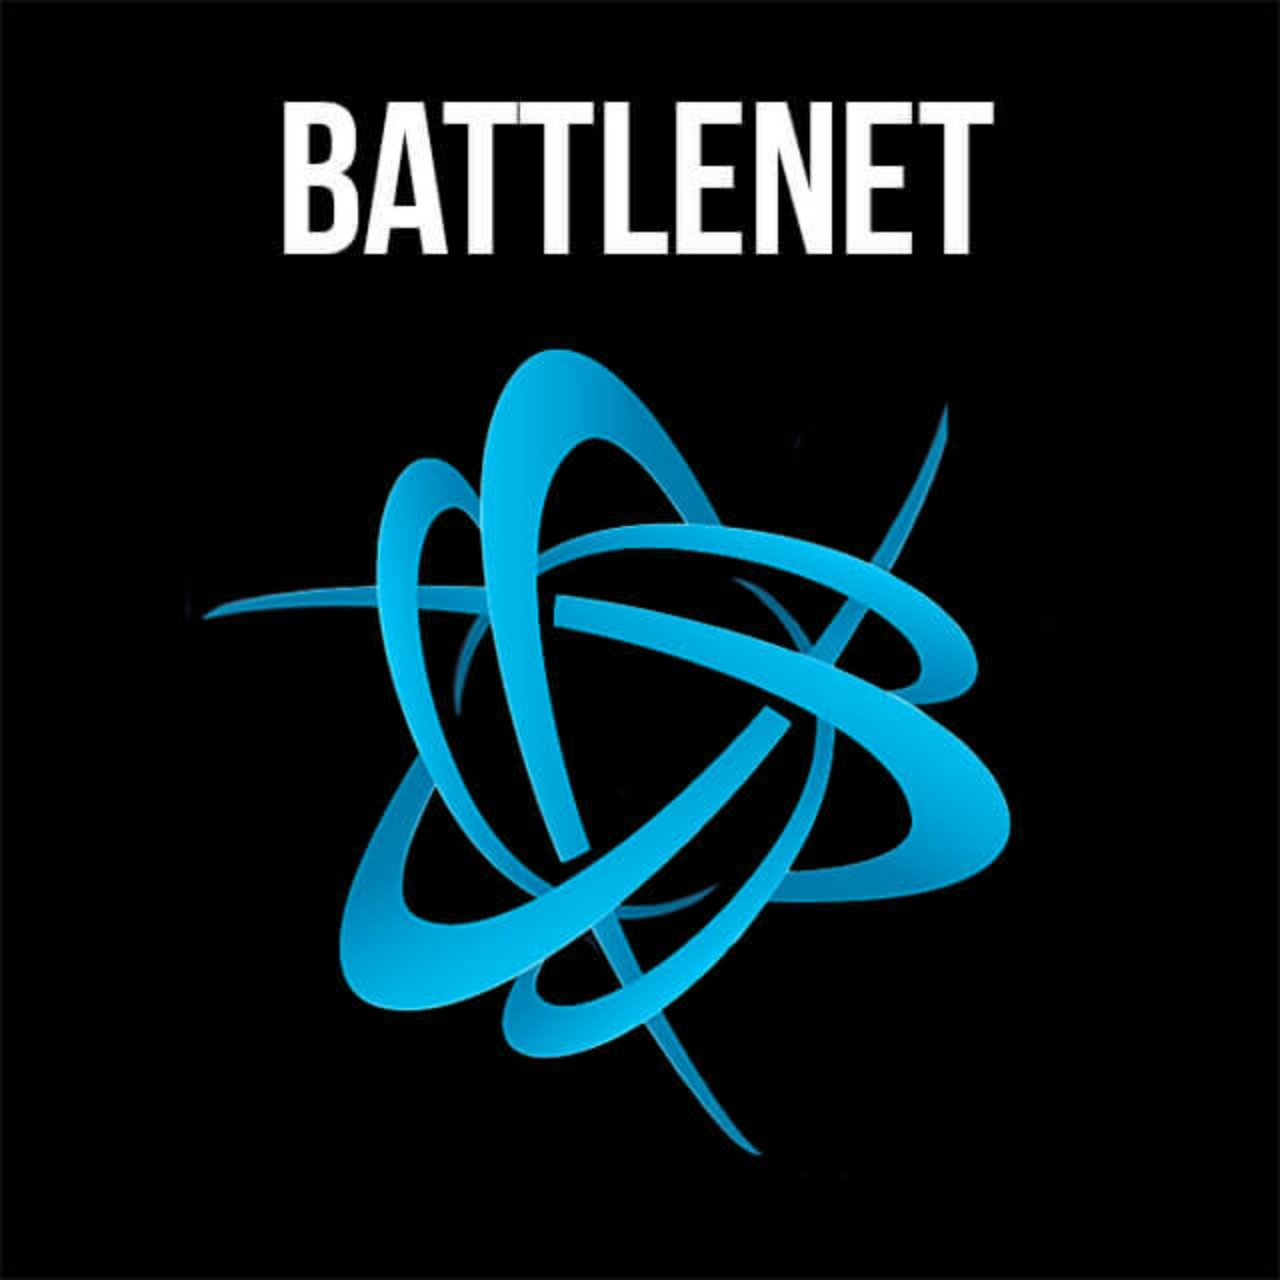 Battlenet Account With Overwatch Battlenet Games Gameflip